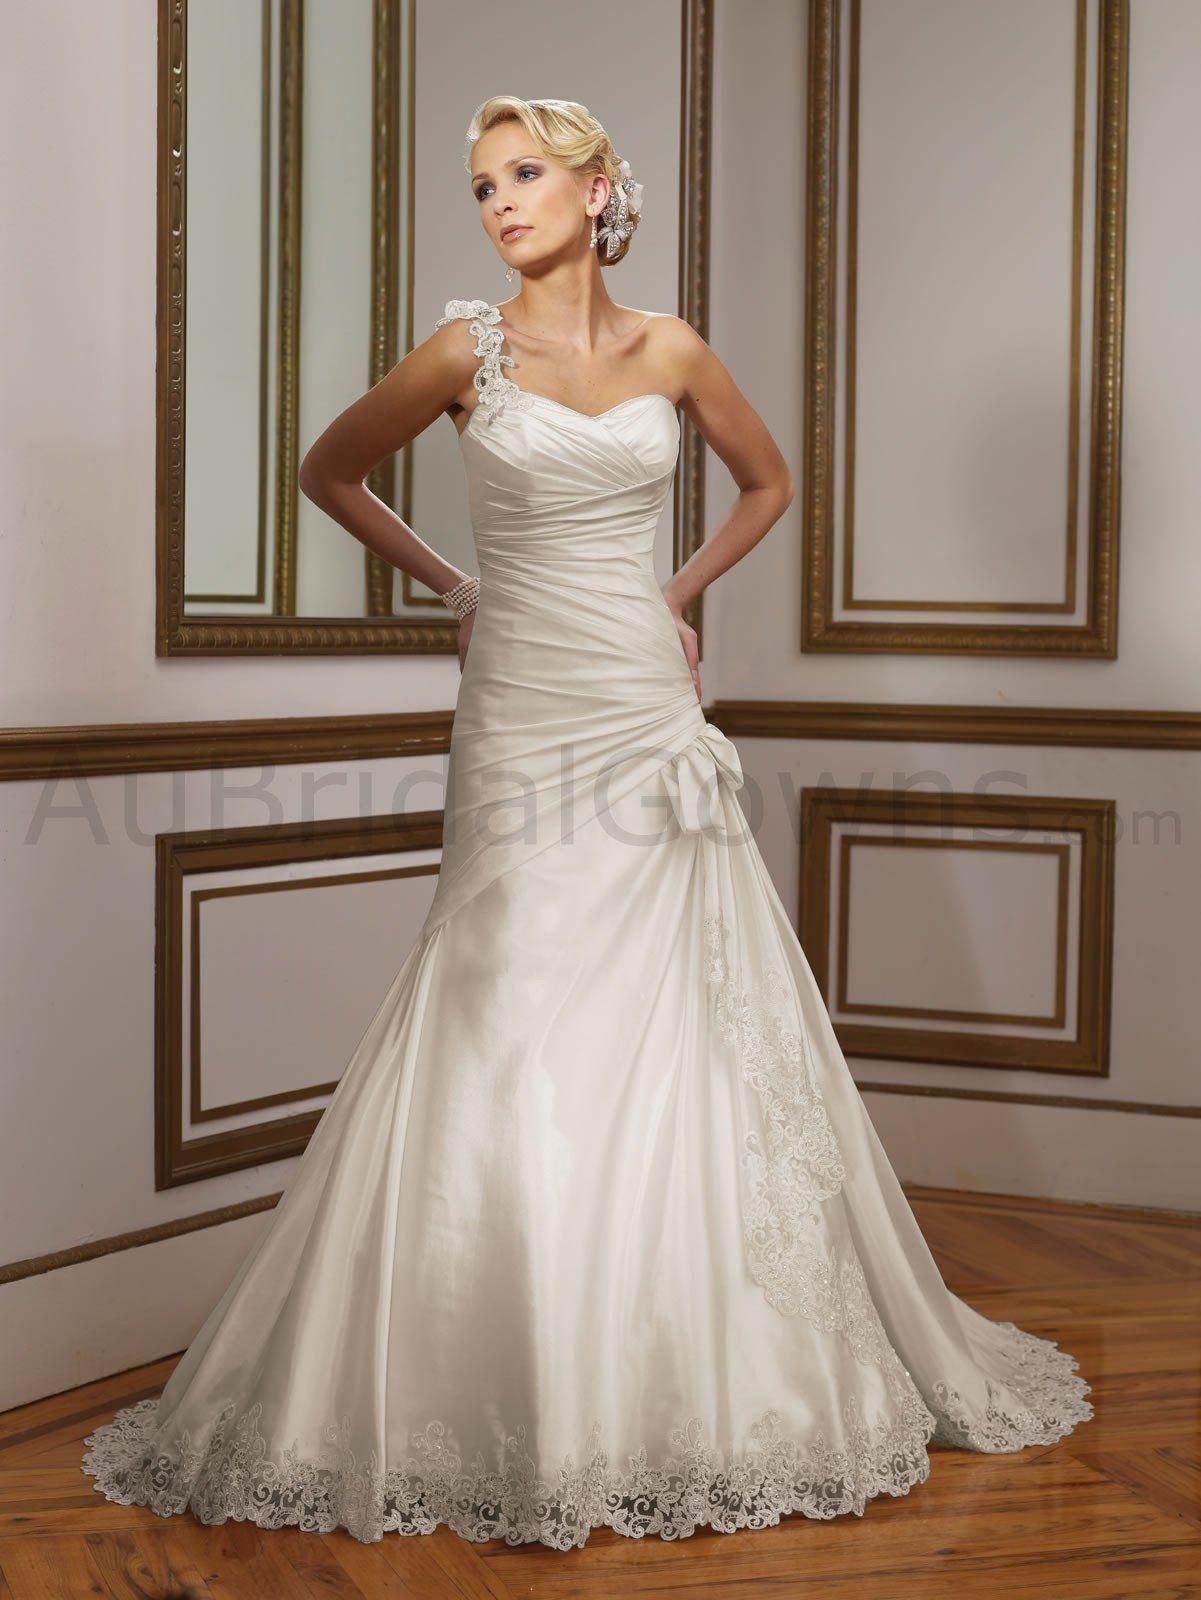 Taffeta Strapless Sweetheart Detachable Lace Bodice Mermaid Wedding Strapless Wedding Dress Sweetheart Sophia Tolli Wedding Dresses Asymmetrical Wedding Dress [ 1600 x 1201 Pixel ]